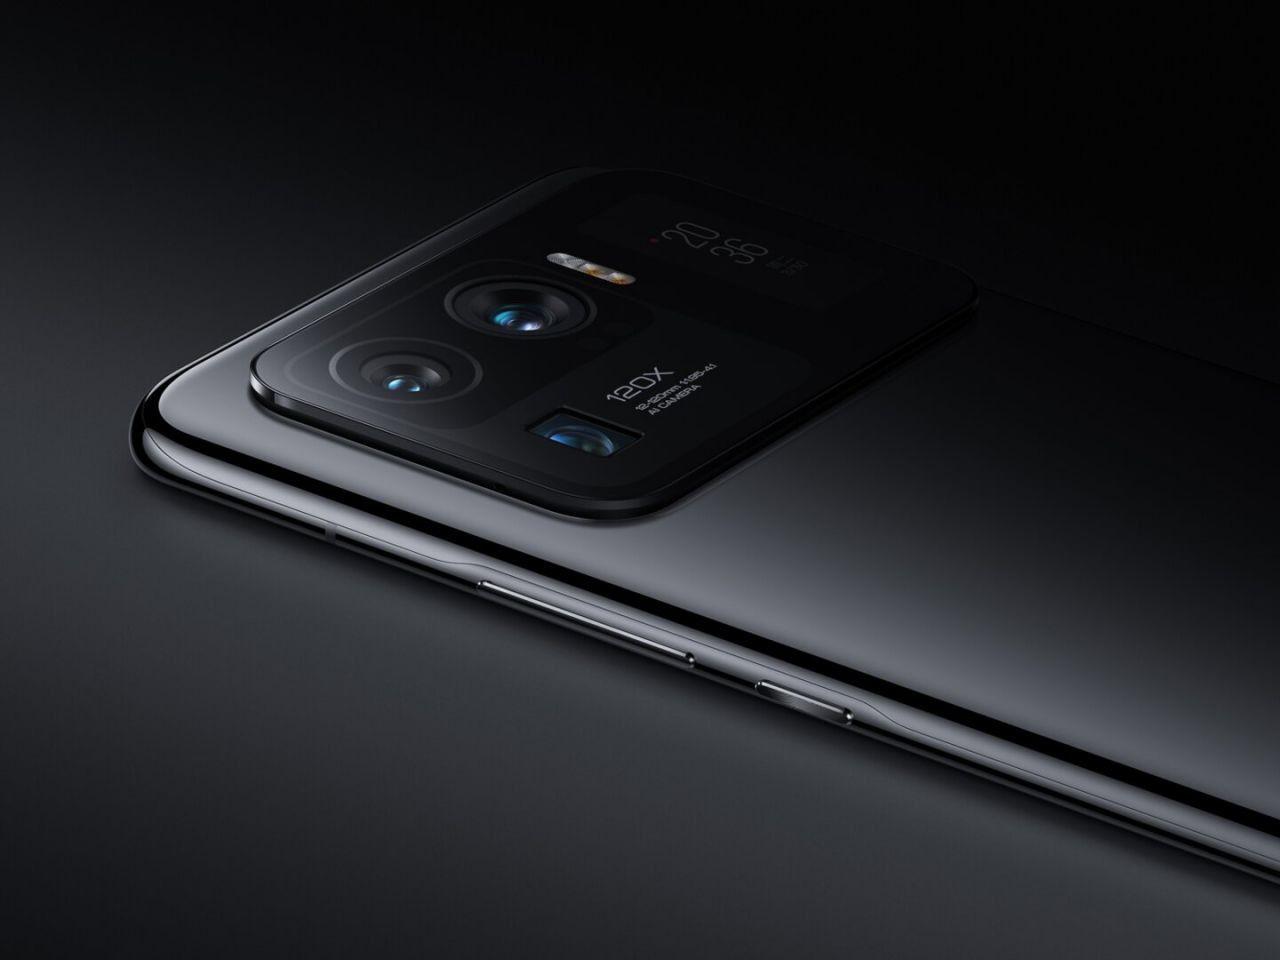 En iyi kameralı Xiaomi telefonlar - Nisan 2021 - Page 1